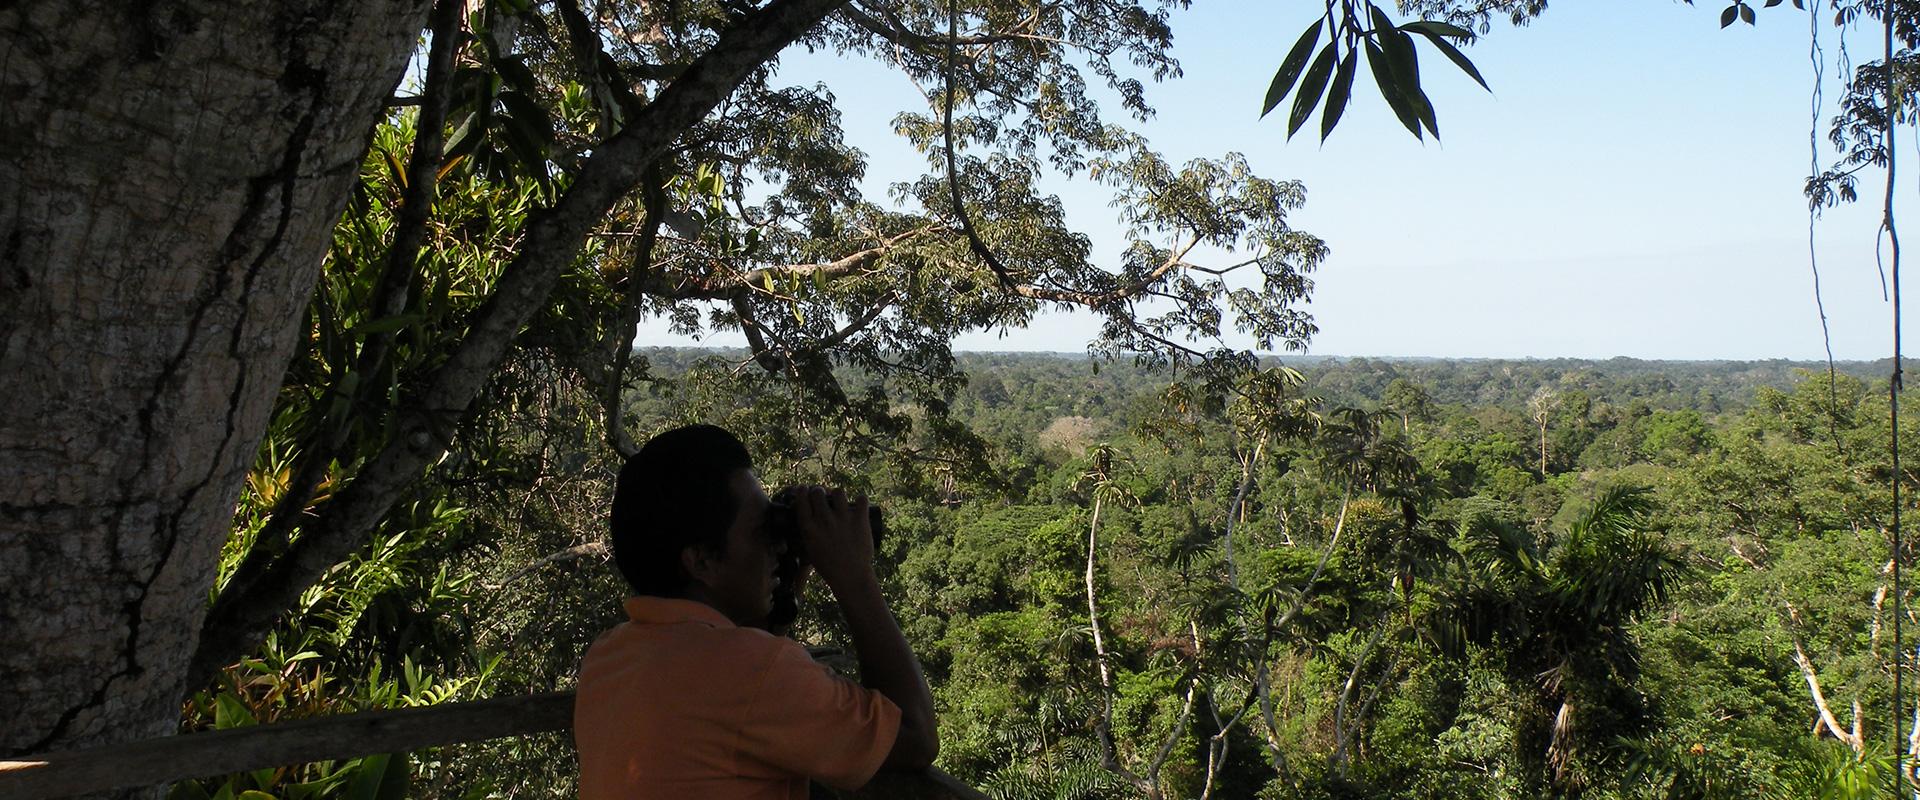 Yarina Amazon Ecuador